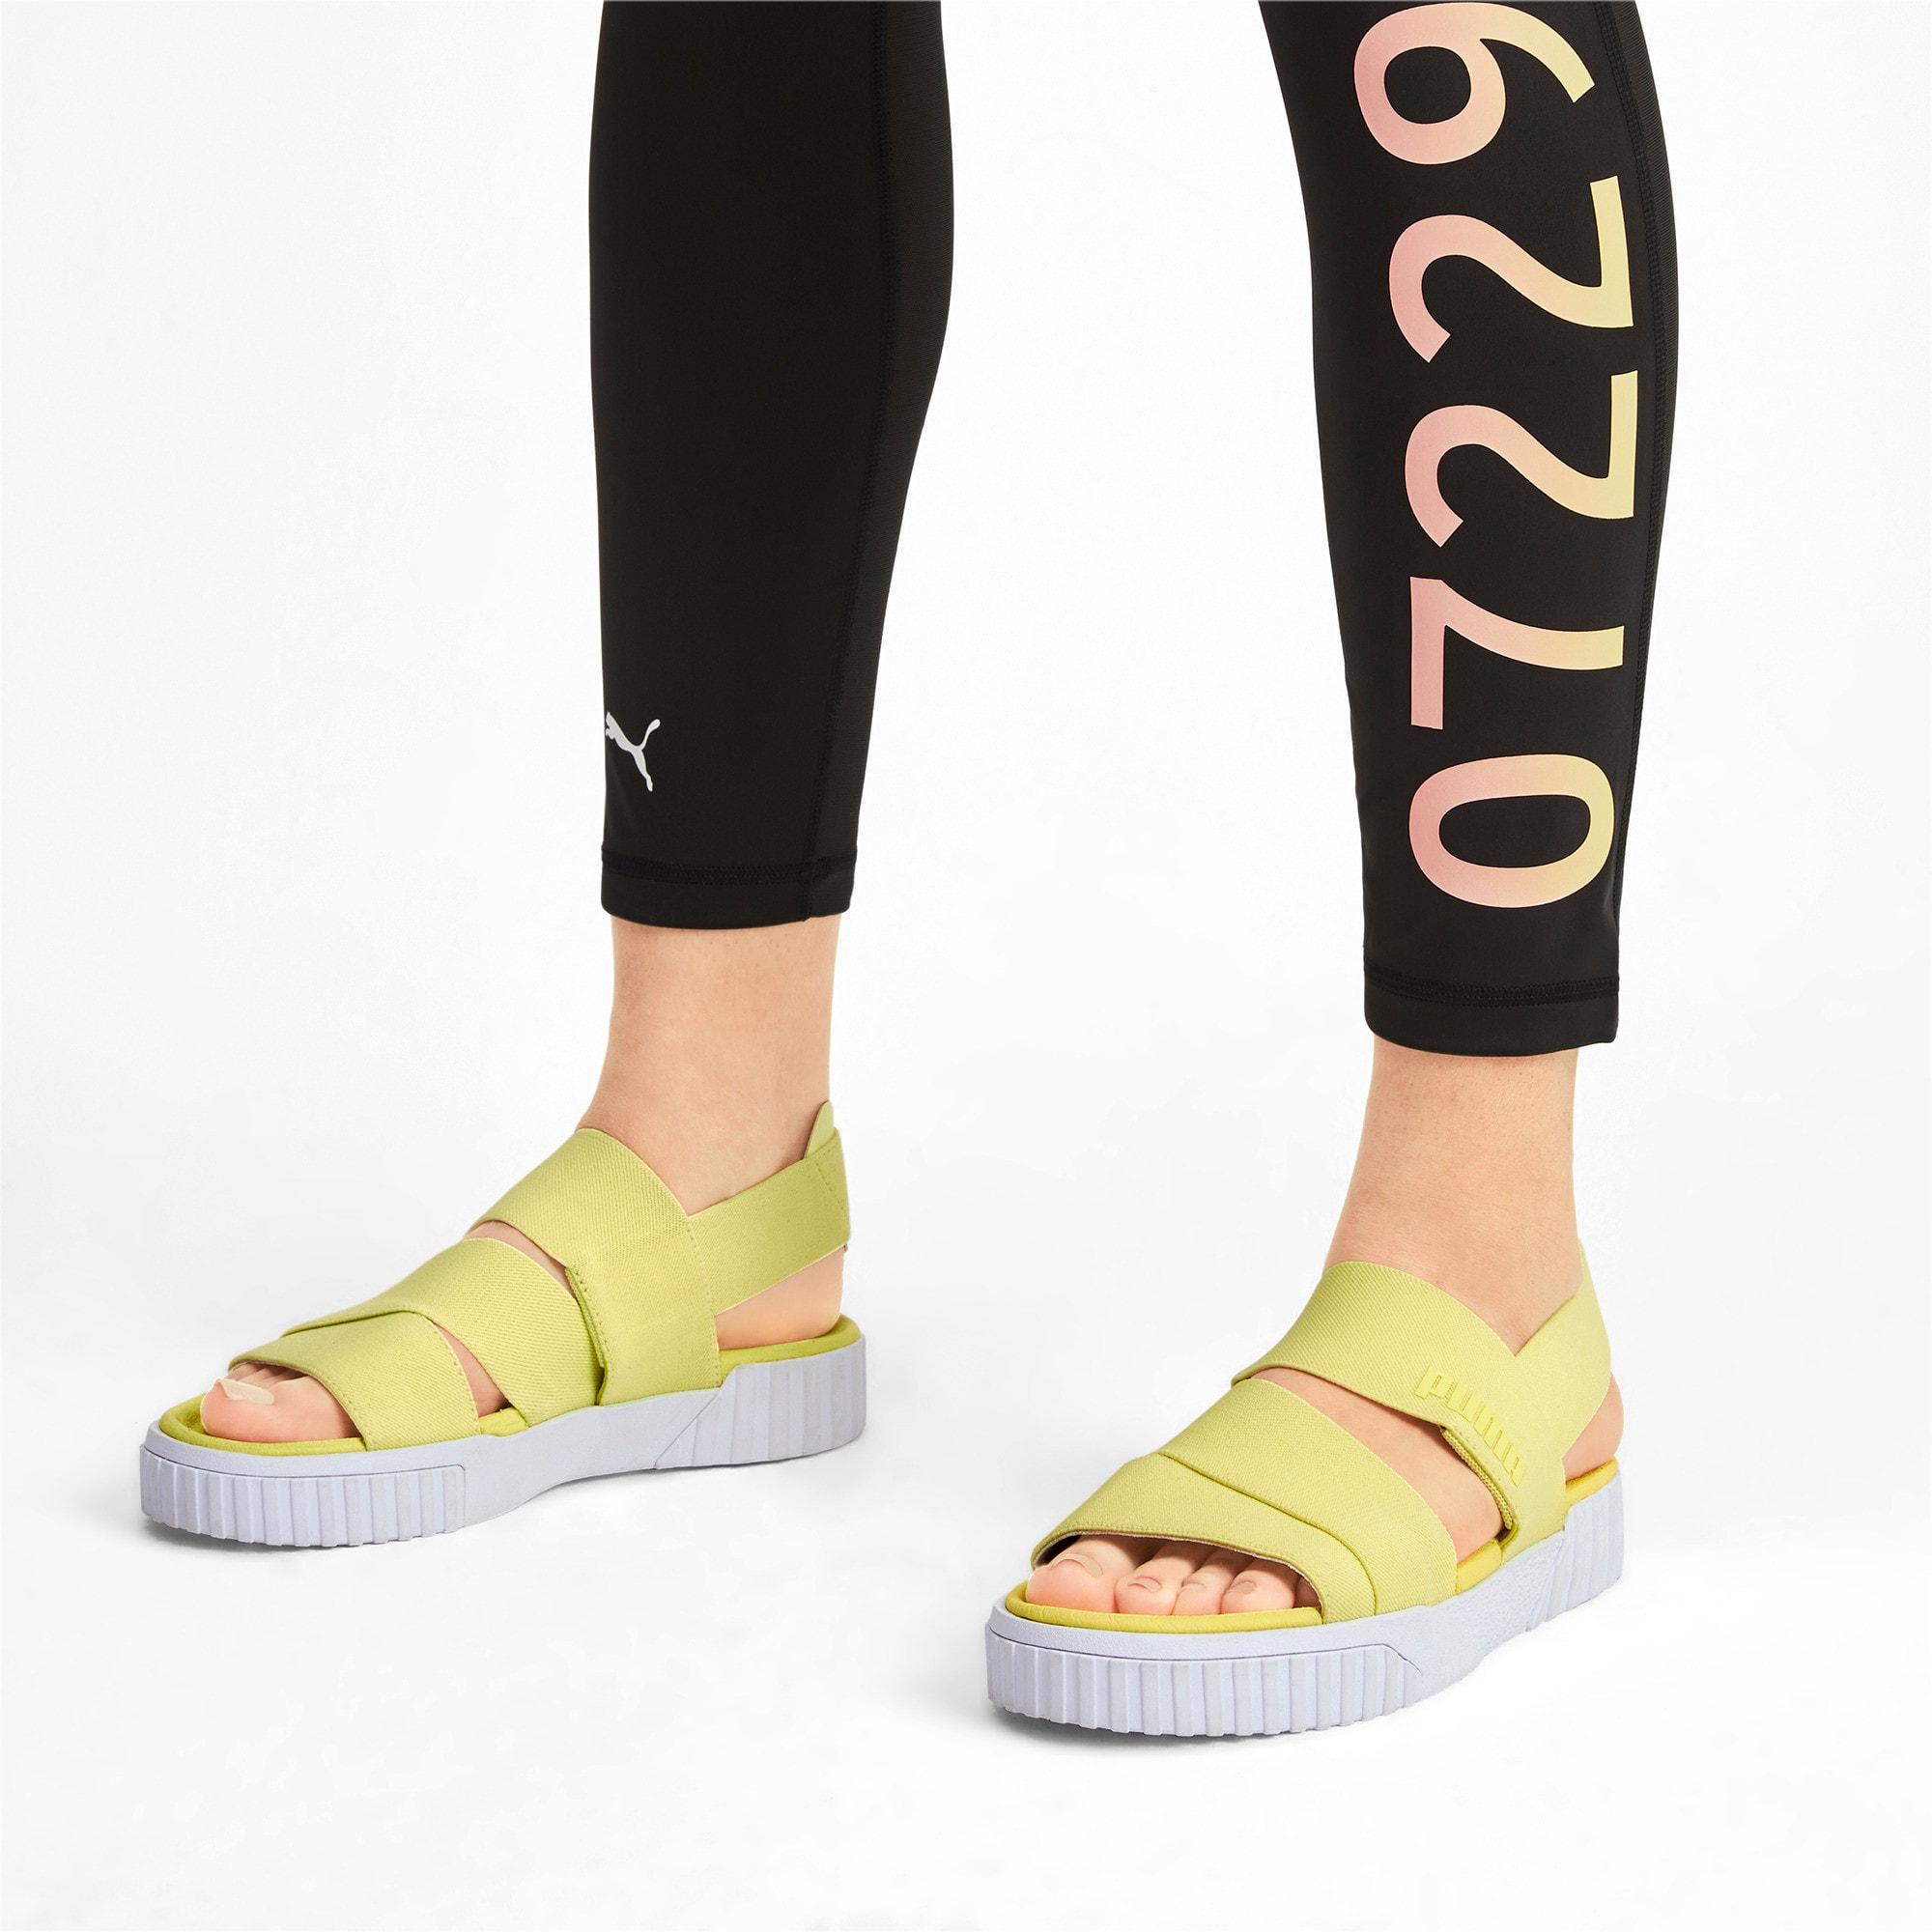 Thumbnail 2 of PUMA x SELENA GOMEZ Cali Women's Sandals, SOFT FLUO YELLOW, medium